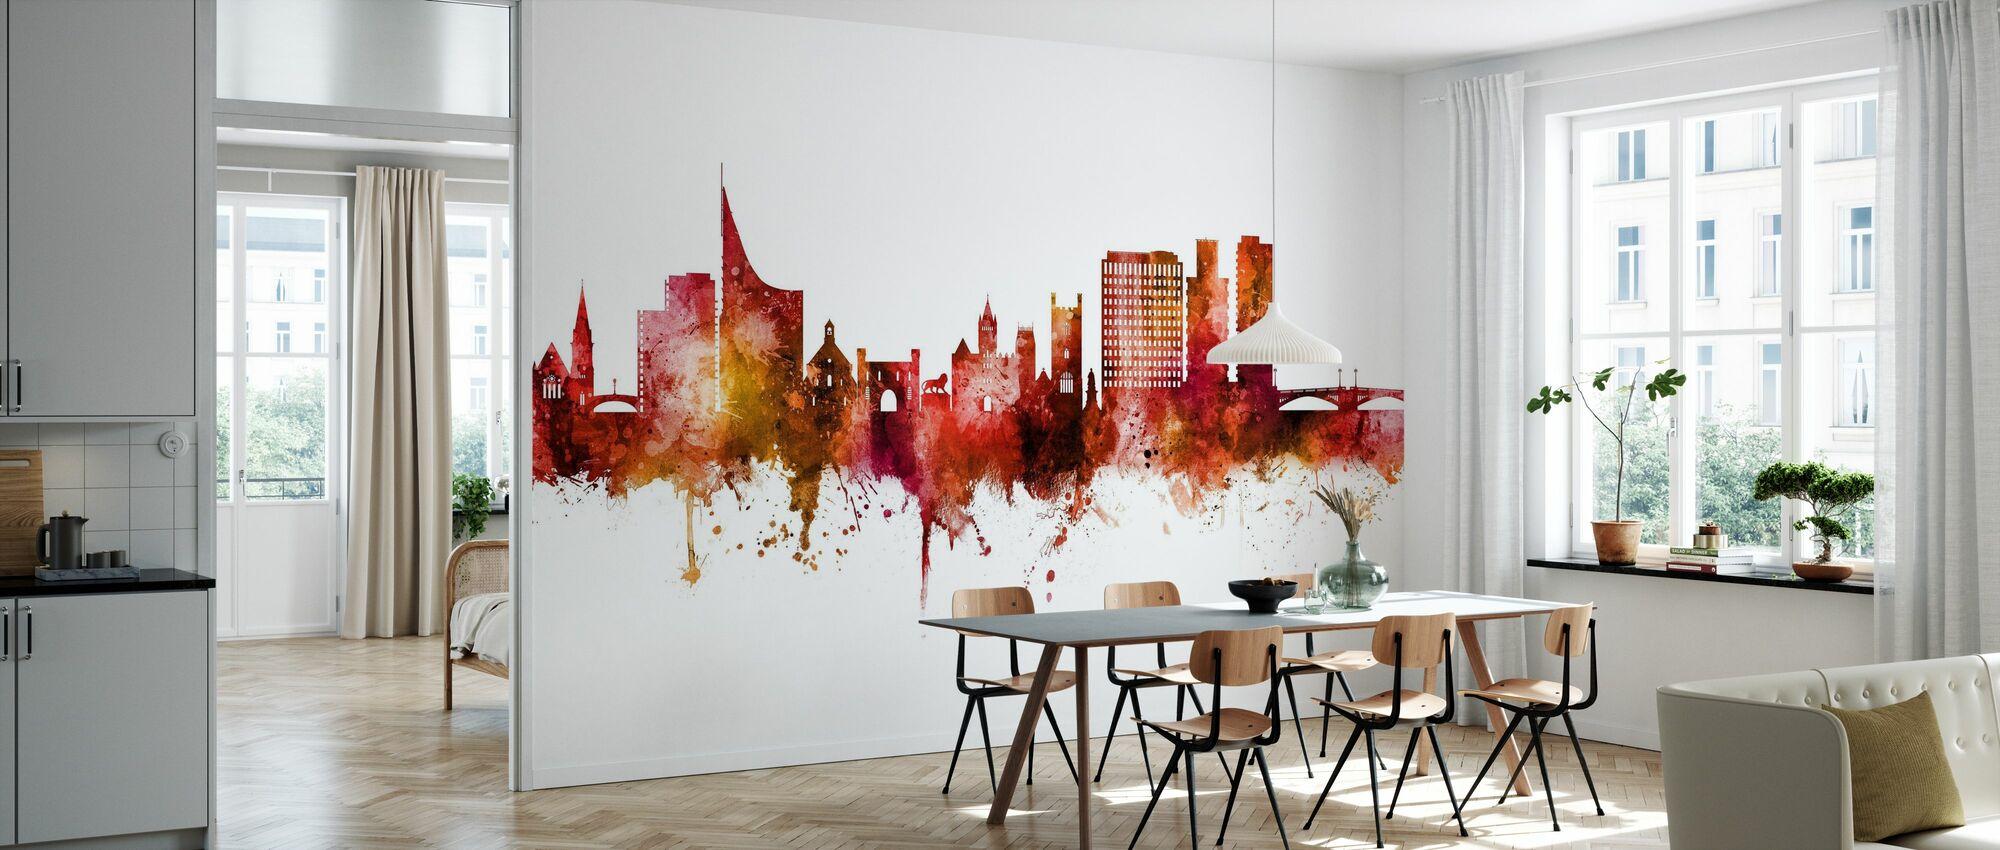 Reading England Skyline - Wallpaper - Kitchen